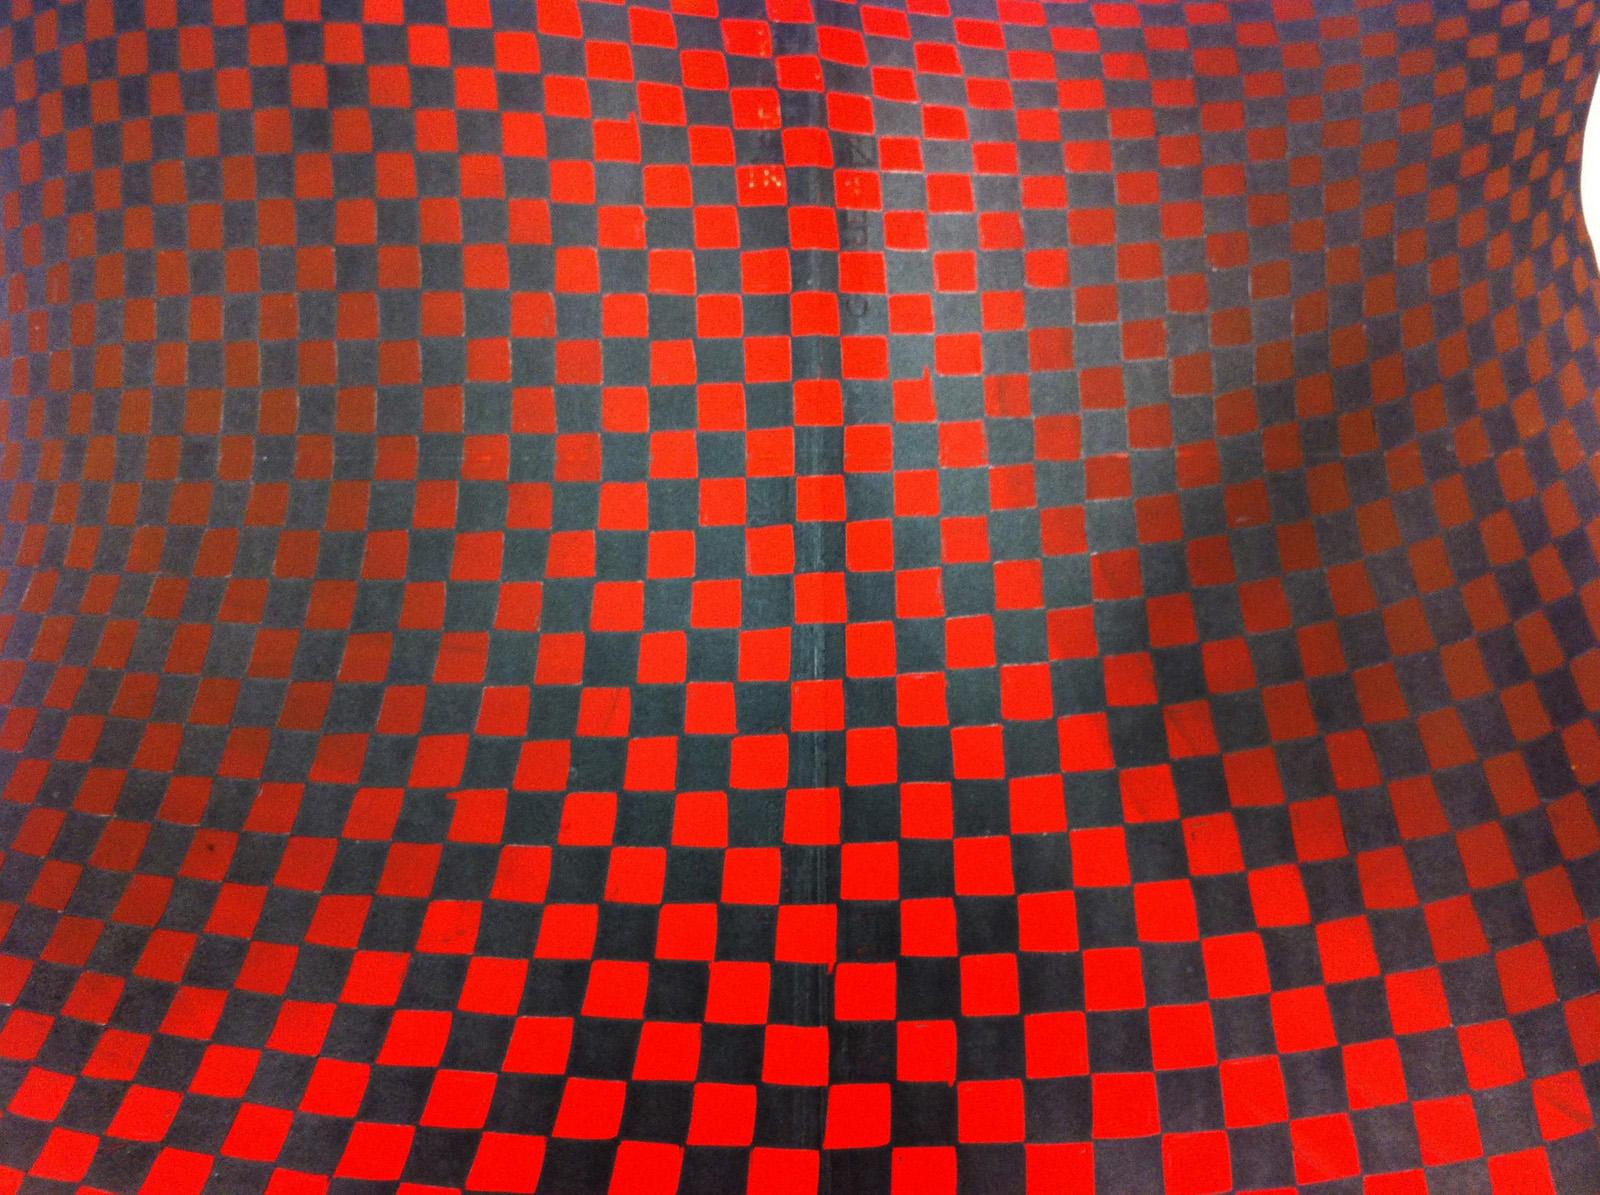 FIGURATIONS X linocut_detail